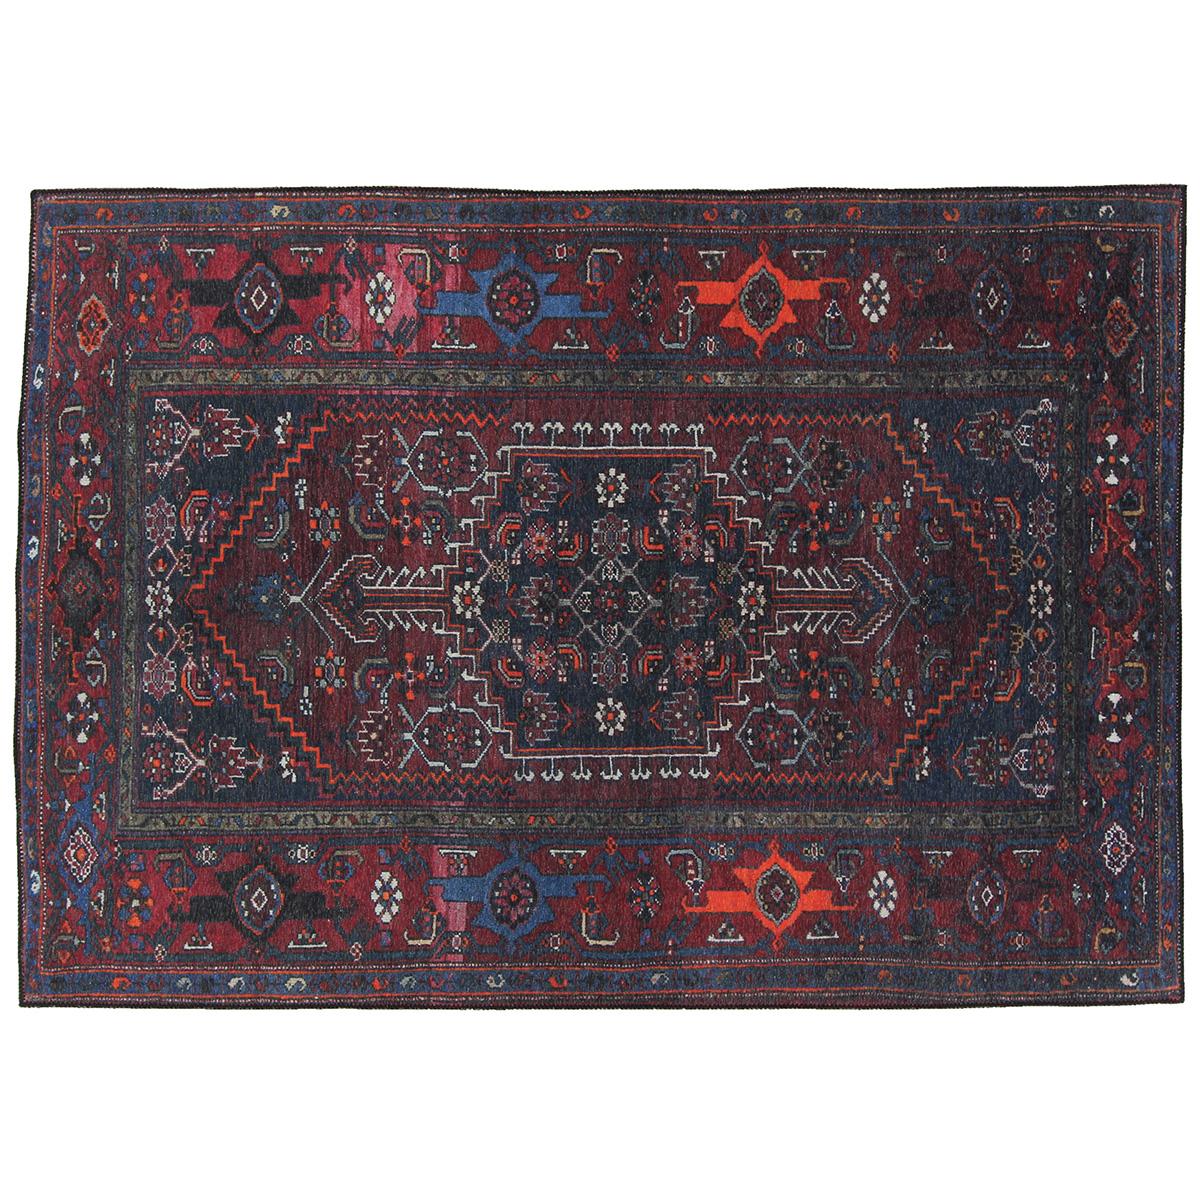 Vloerkleed Brinker Xotin Ethnic | 160 x 230 cm